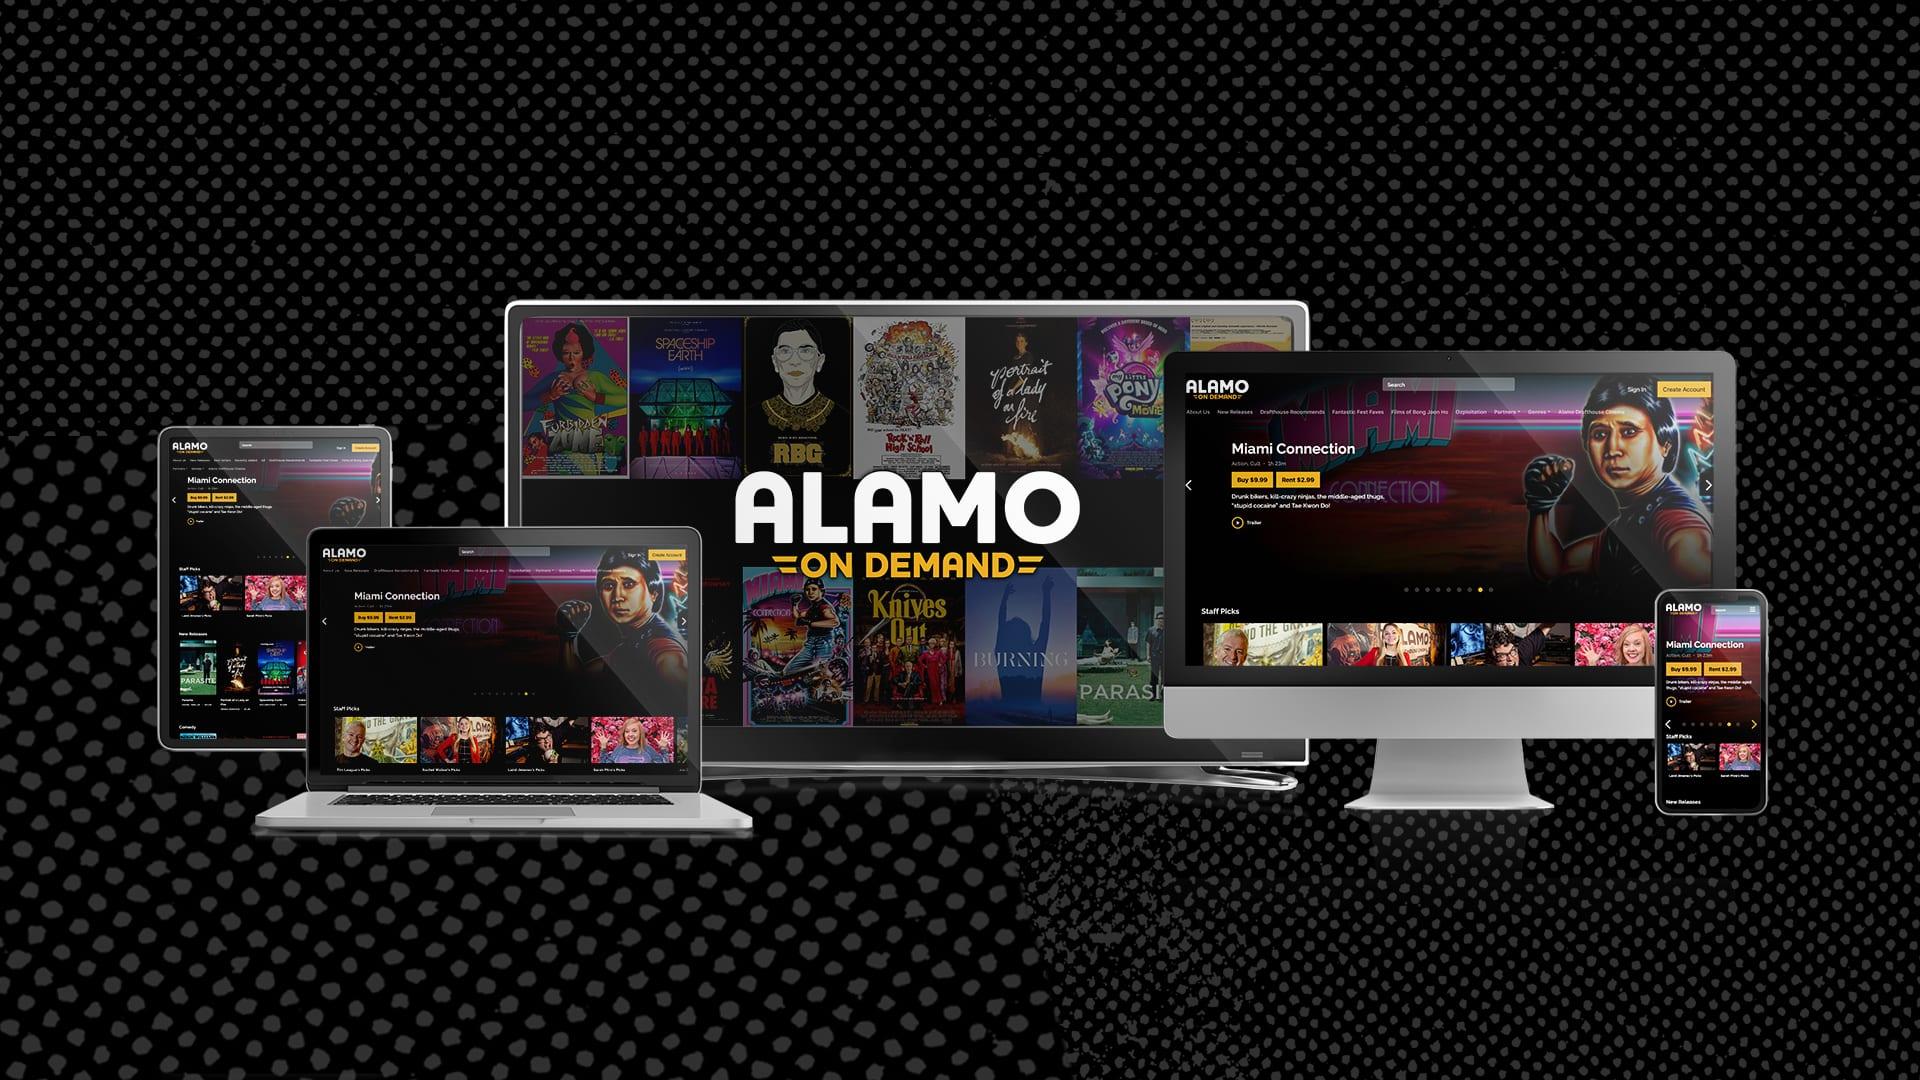 Alamo Drafthouse Cinema launches video-on-demand platform